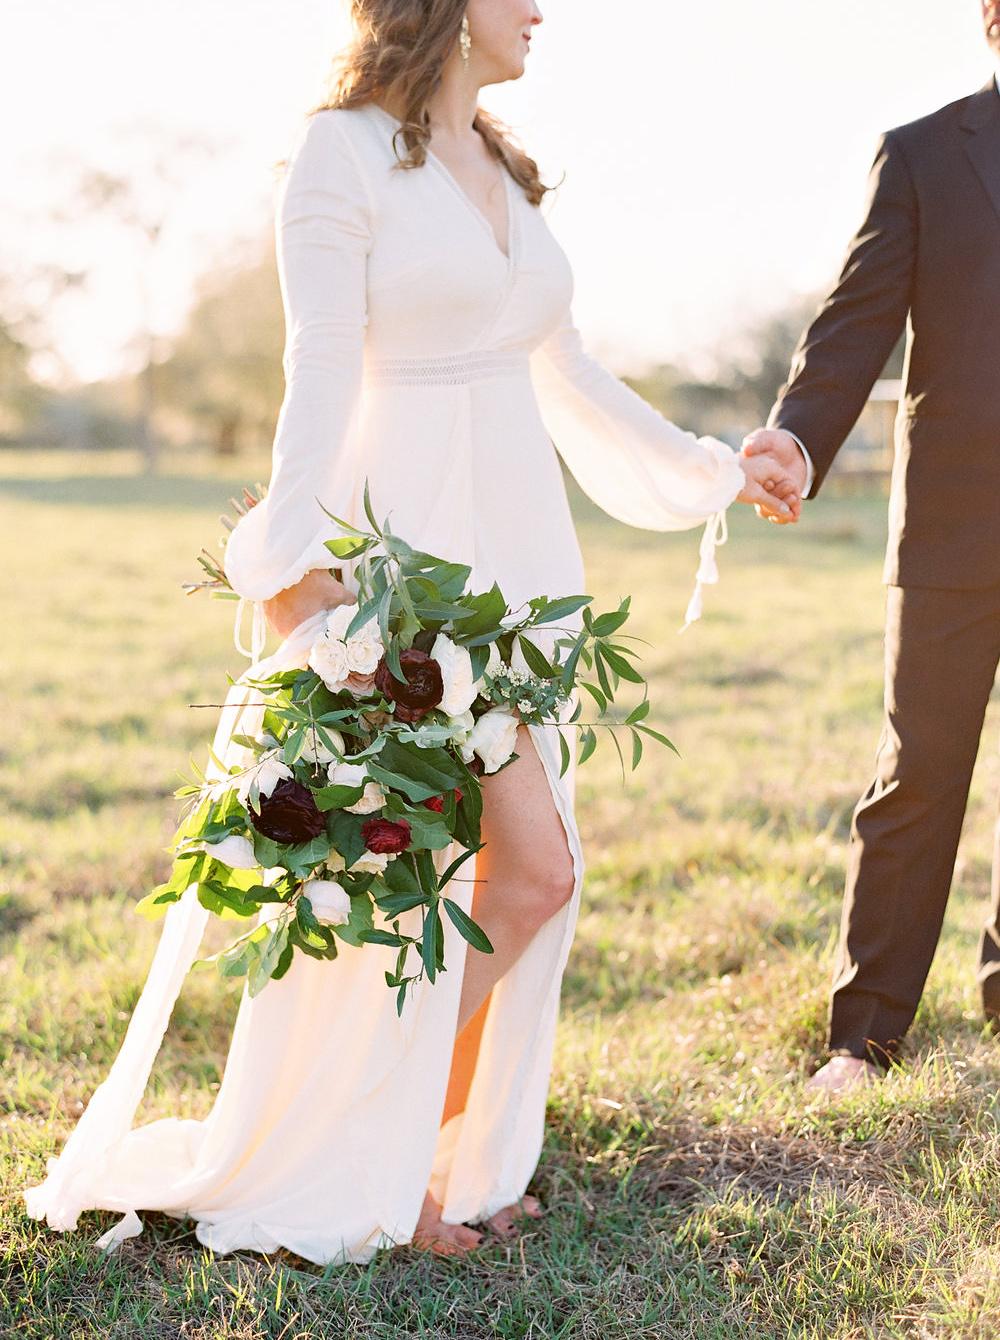 Fine Art Marriage, Hunter Ryan Photo, Florida Vow Renewal